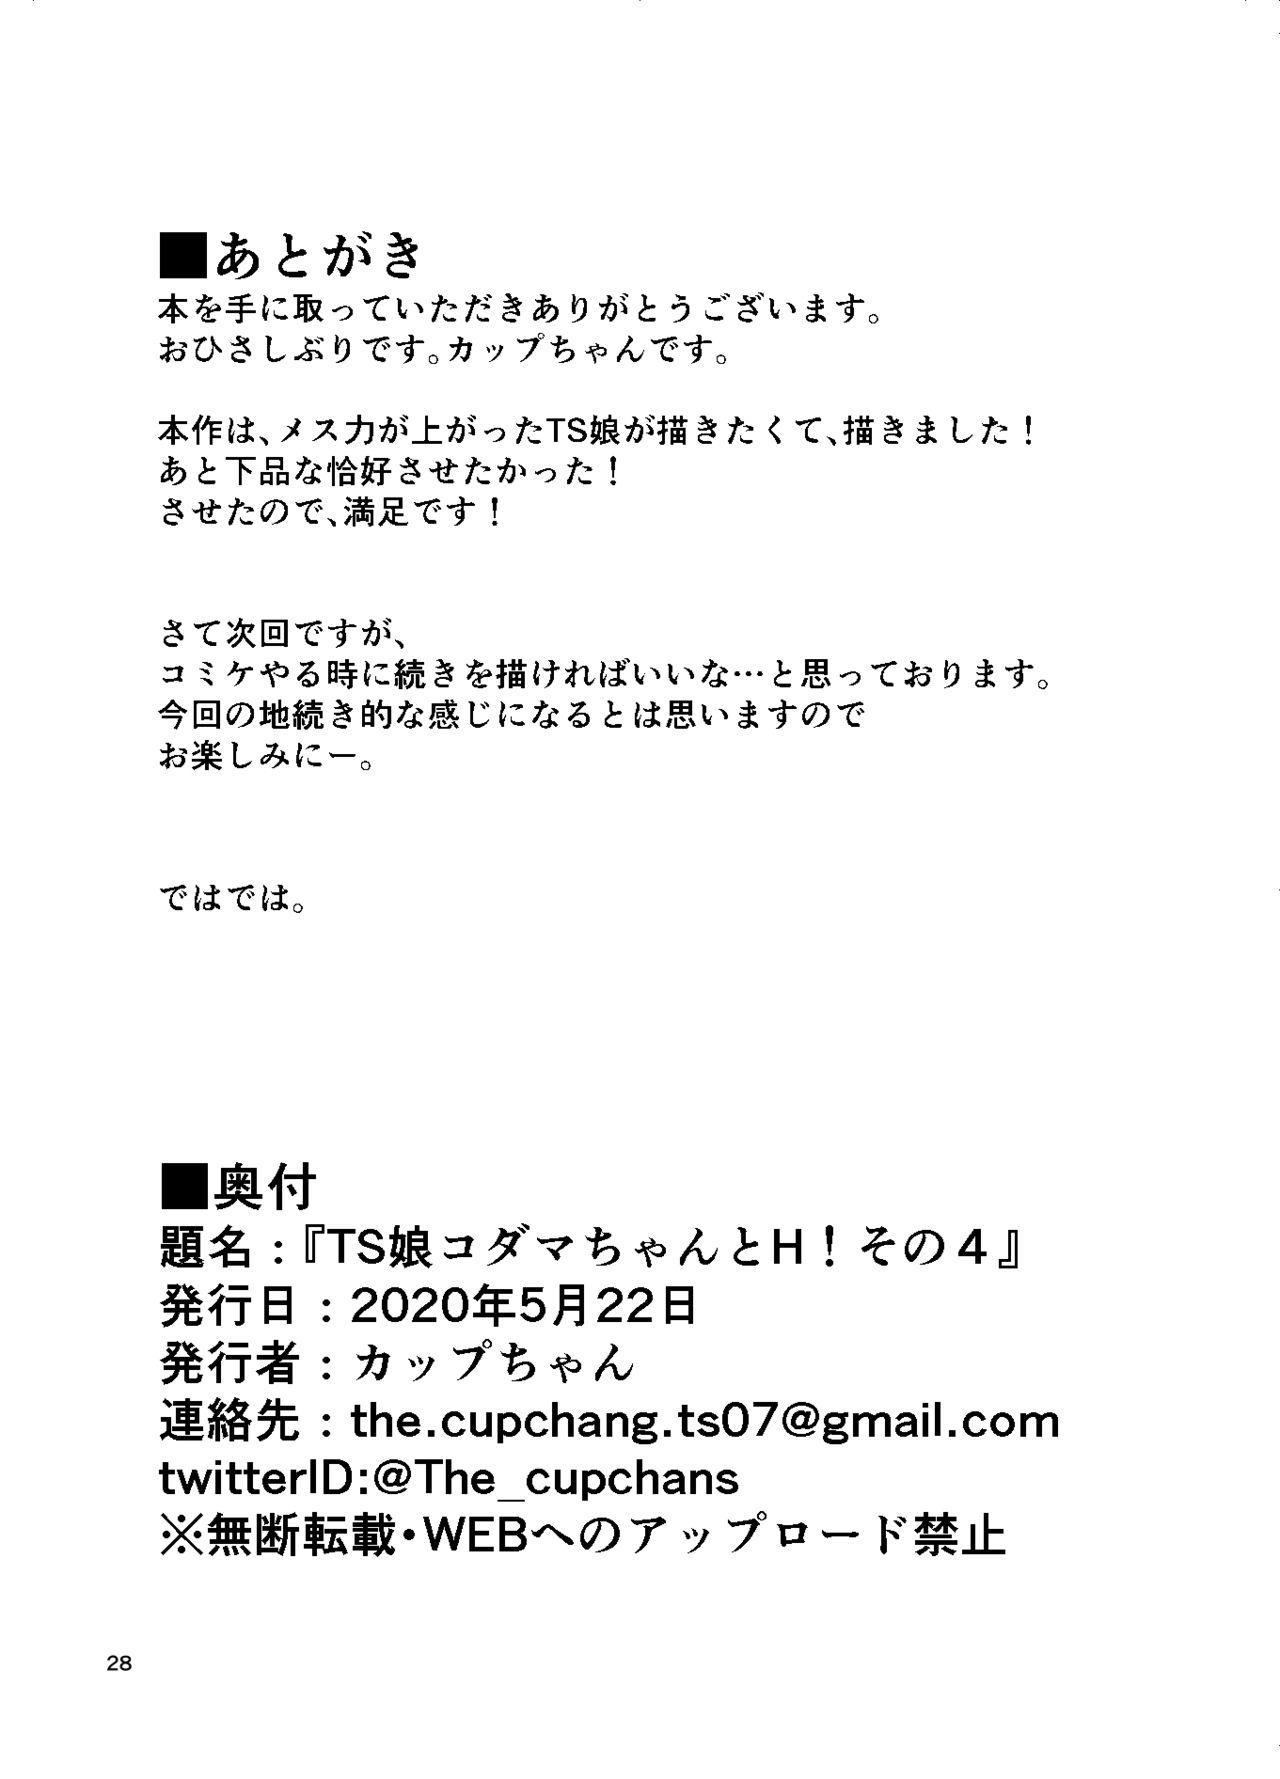 [Wakuseiburo (cup-chan)] TS Musume Kodama-chan to H! Sono 4 | TS Girl Kodama-chan and Ecchi! Part 4 [Digital] 28